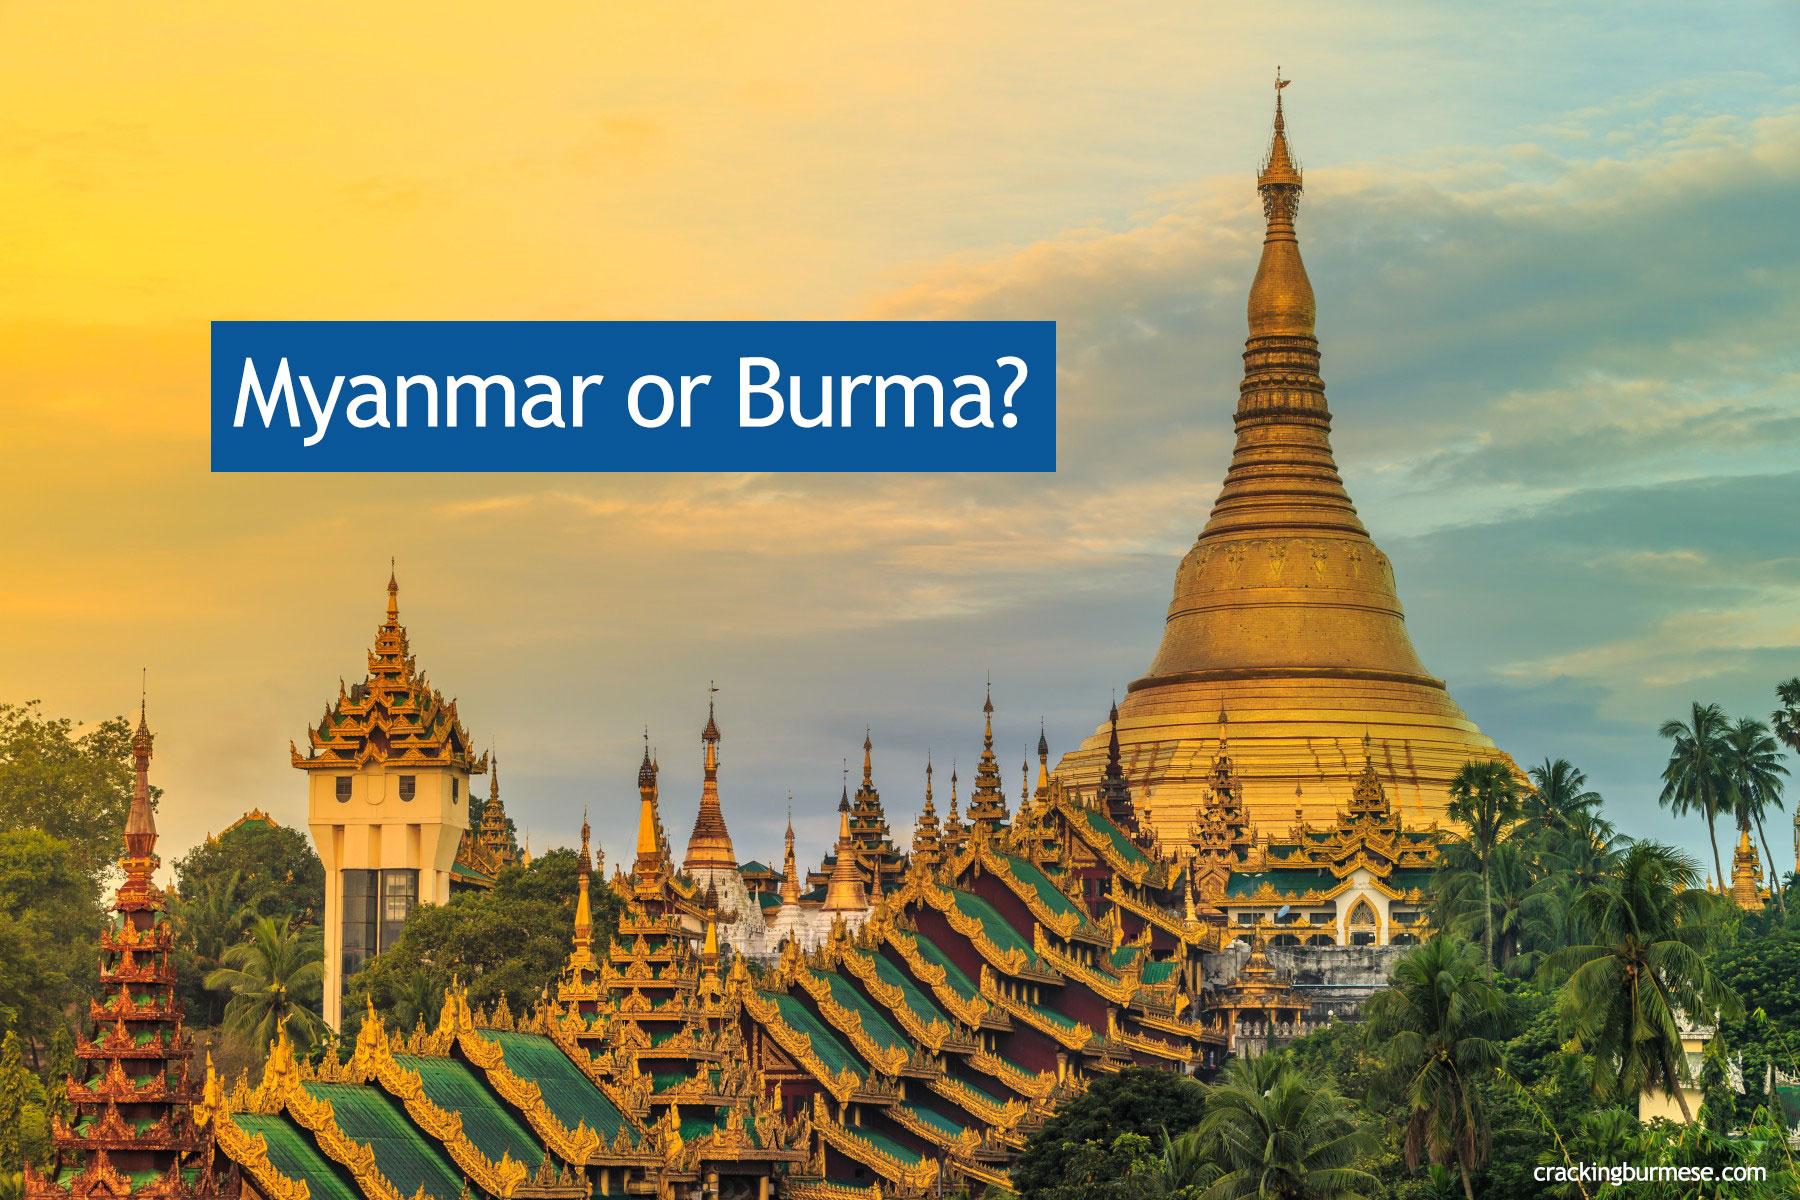 Myanmar or Burma? Burmese or Myanmar language?